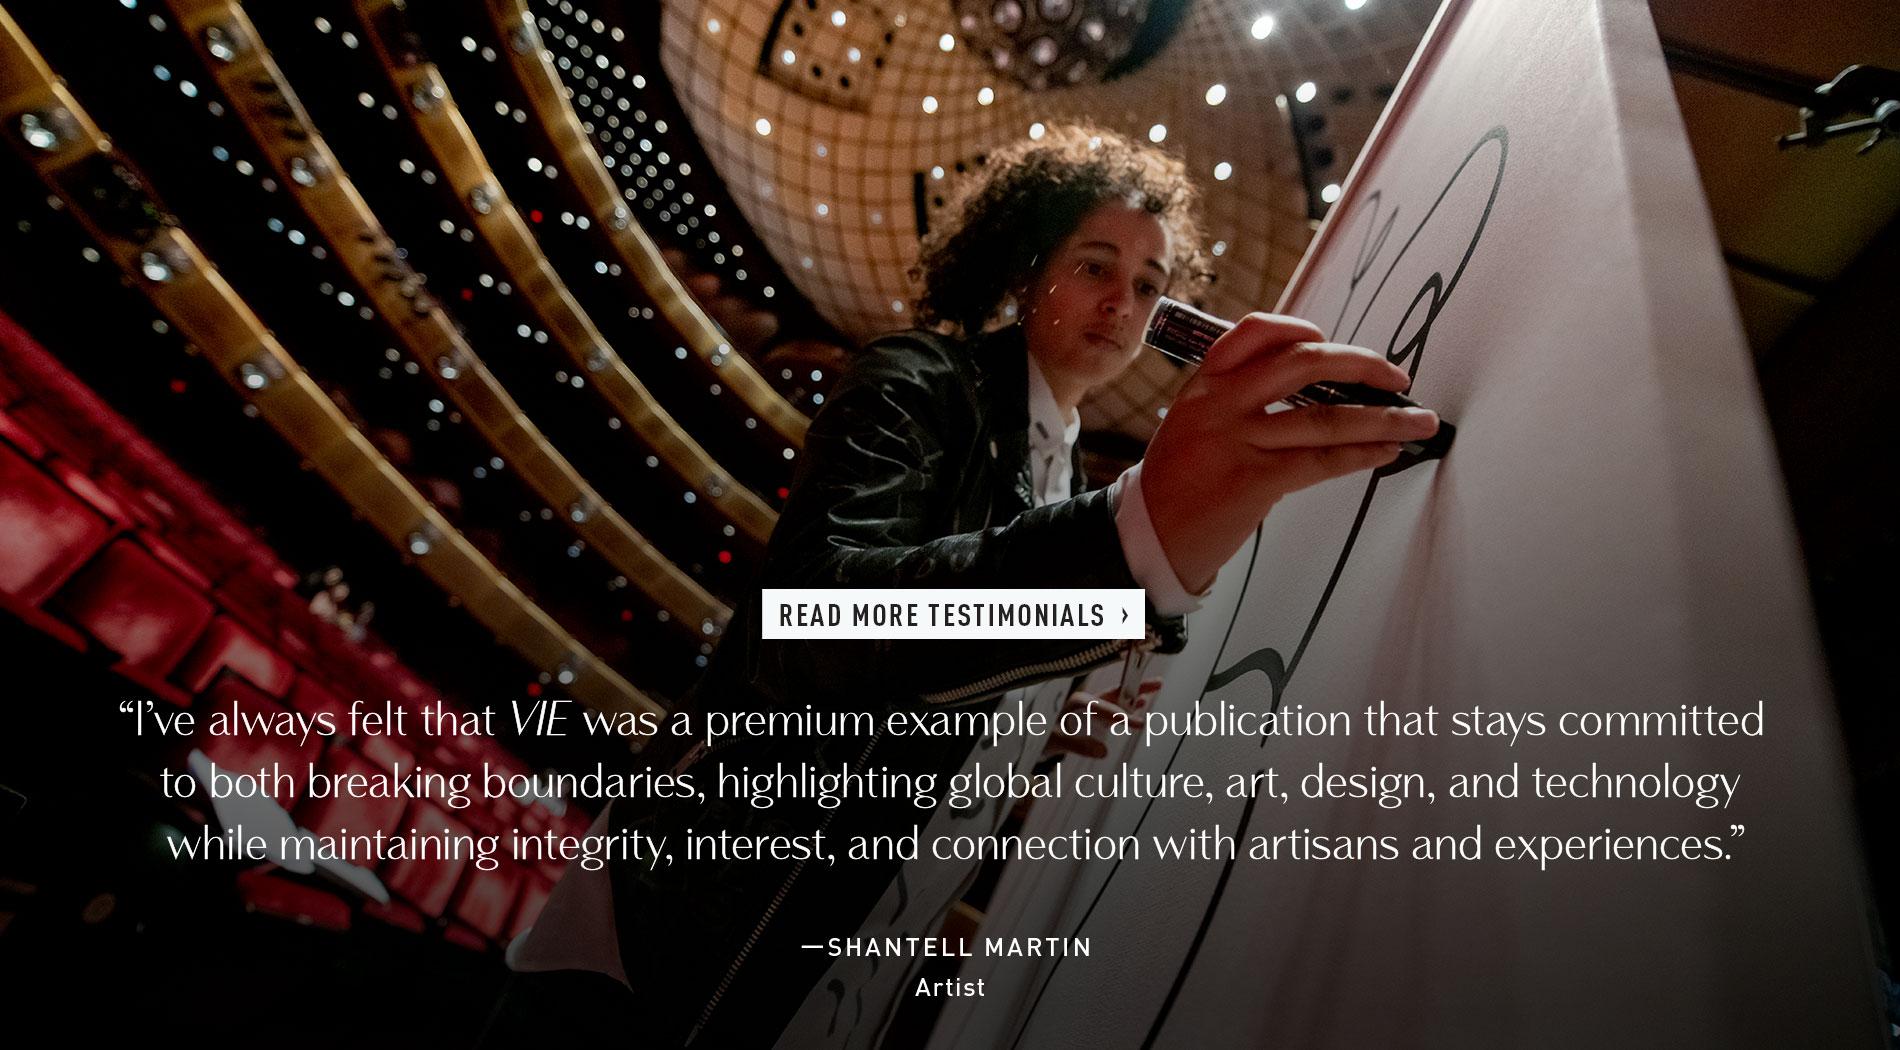 Shantell Martin, Artist - VIE Testimonial